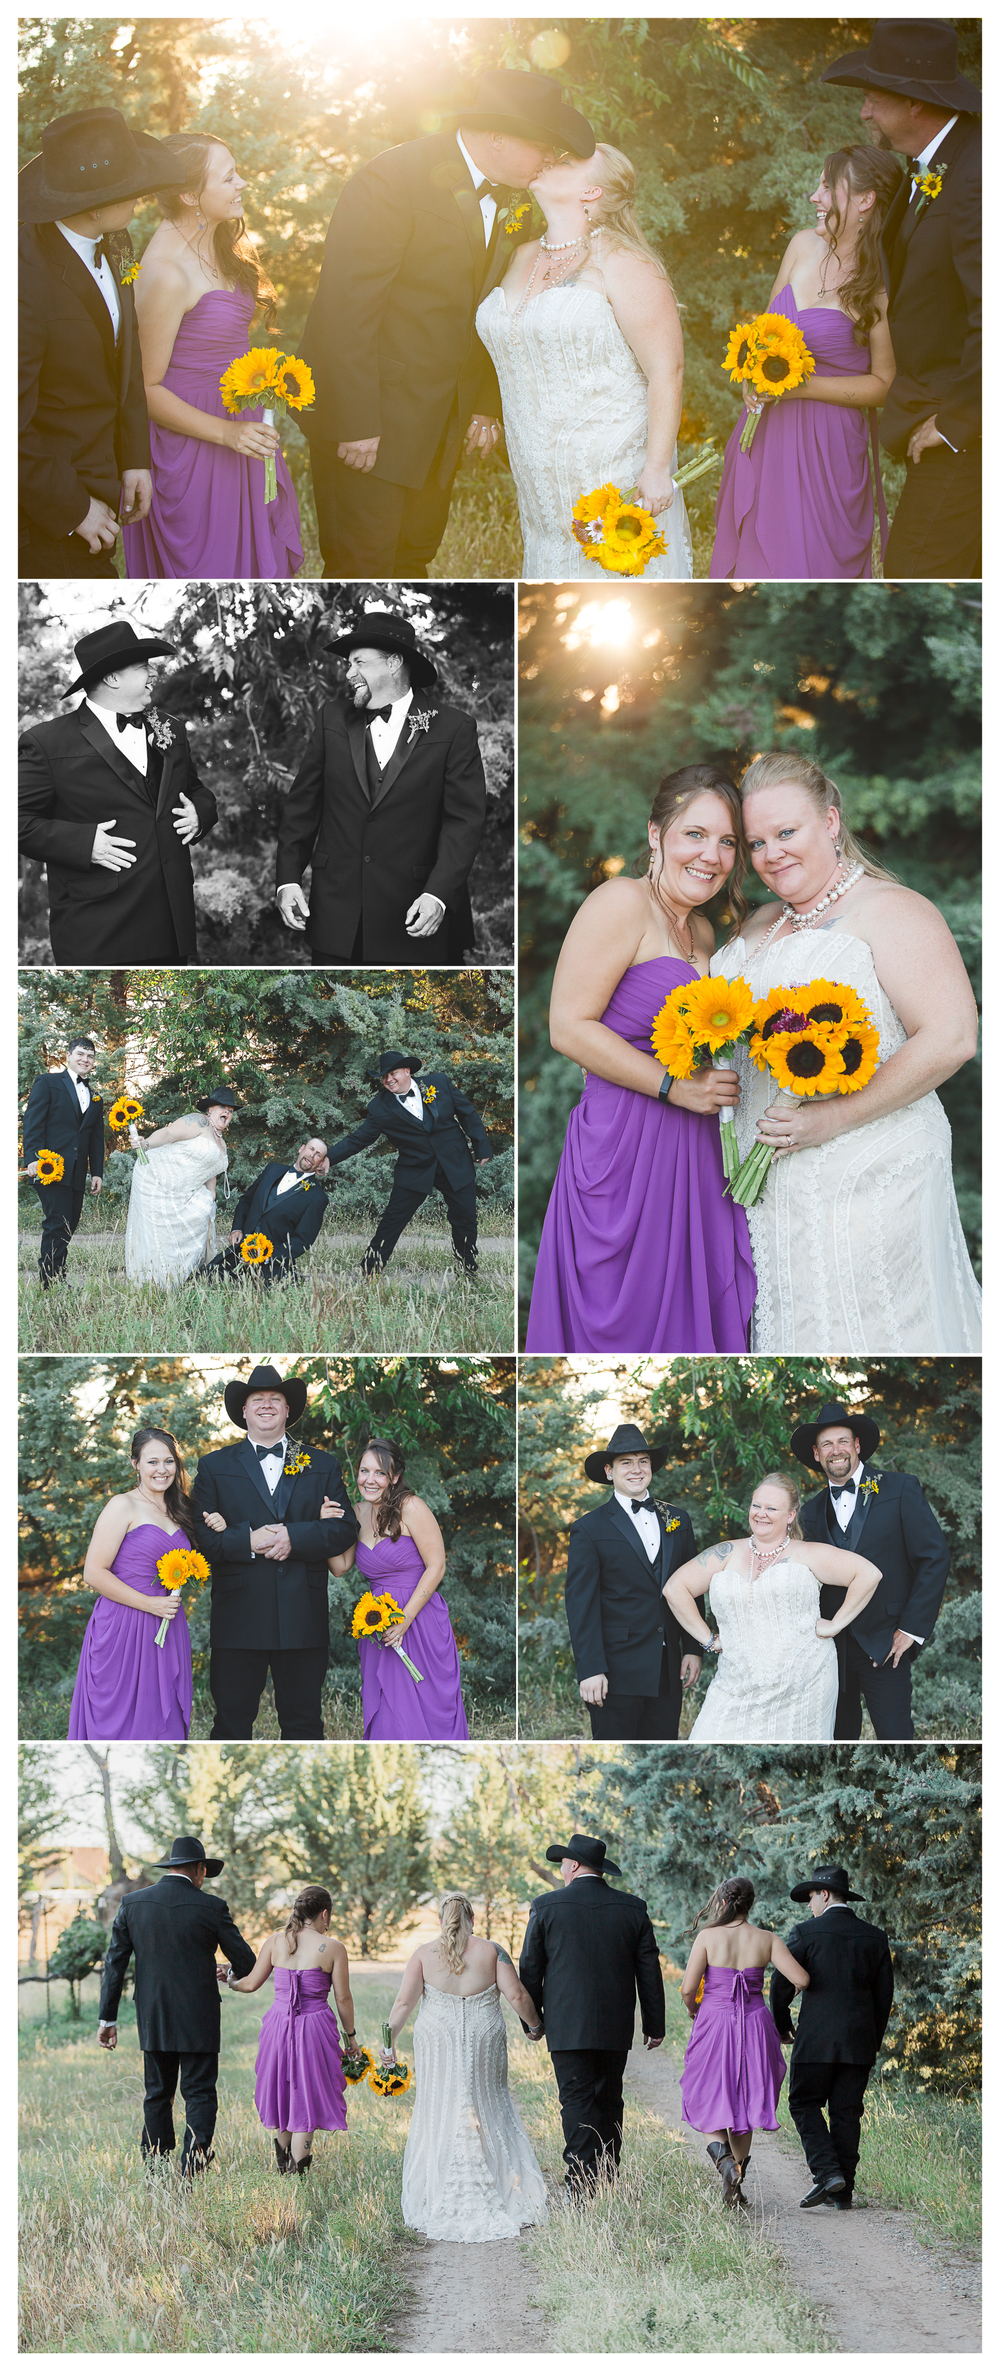 wed party-2.jpg